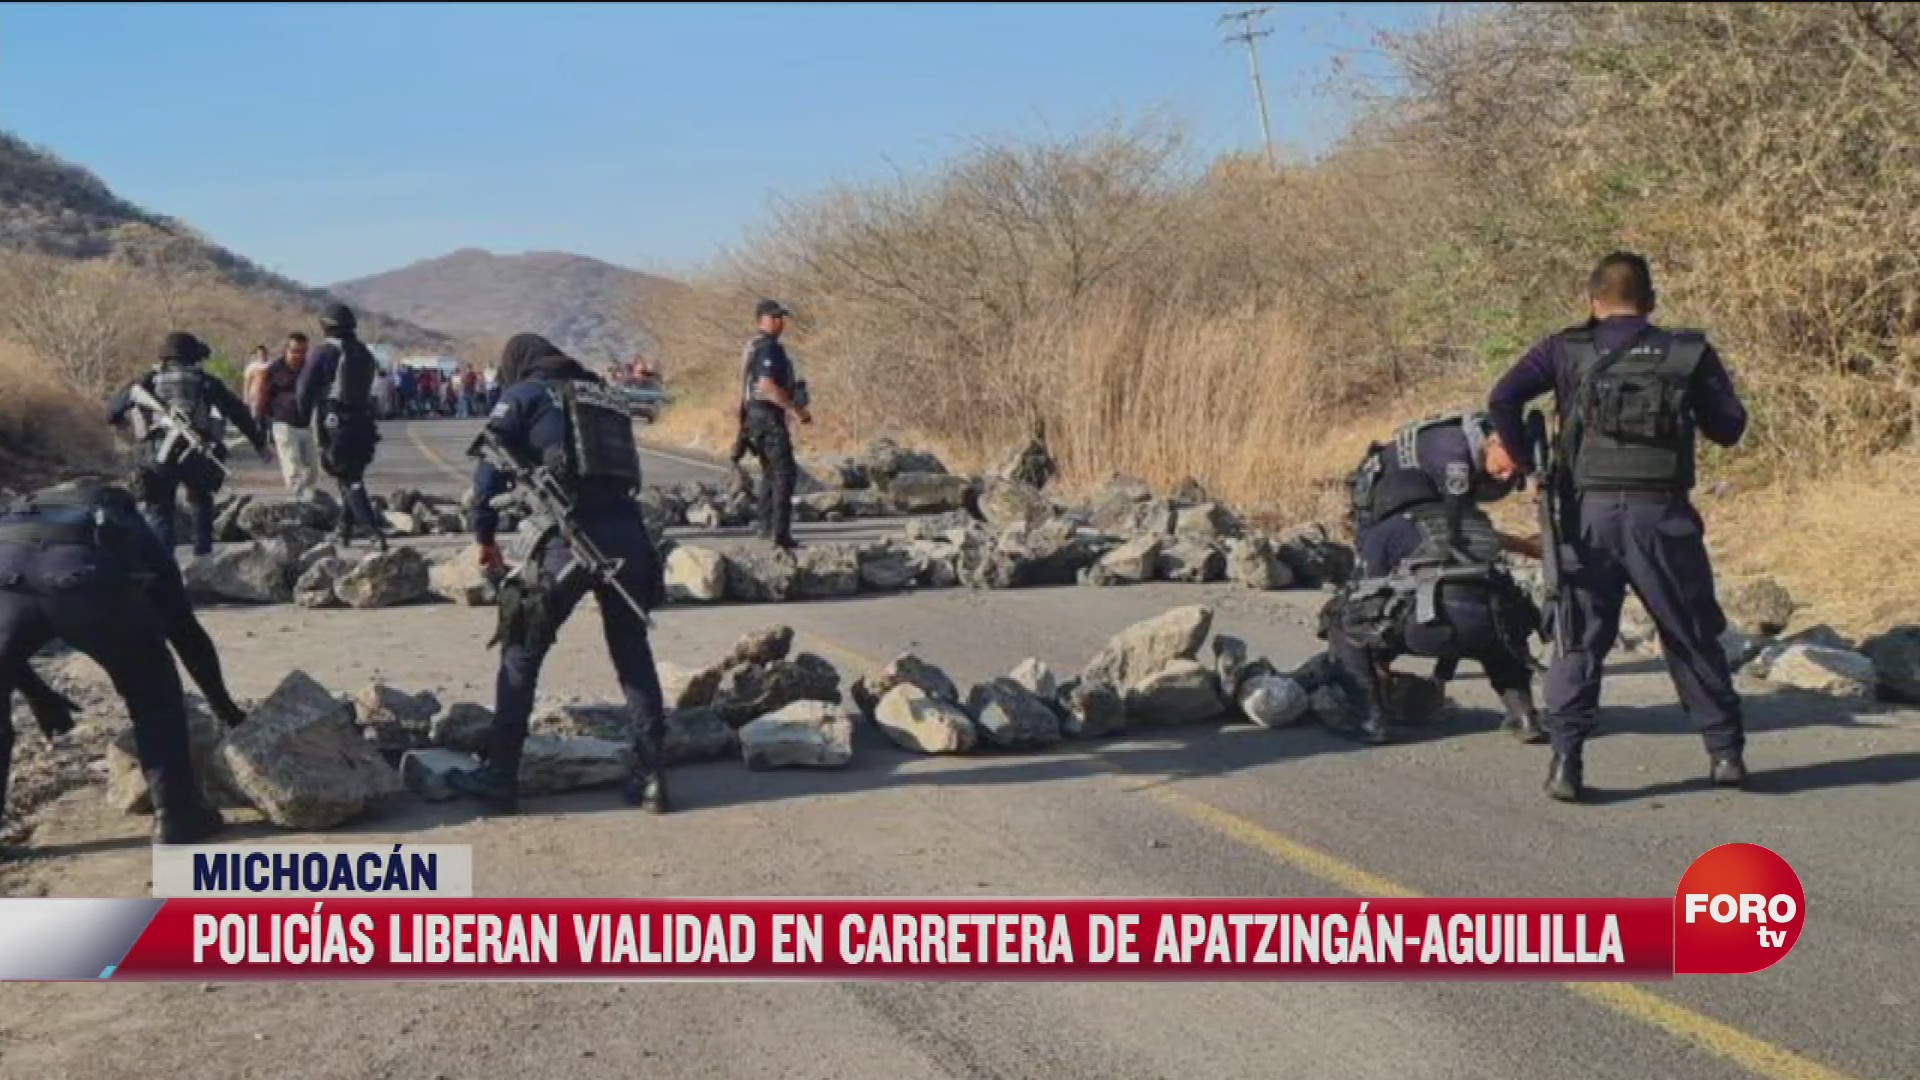 policias liberan carretera apatzingan aguililla